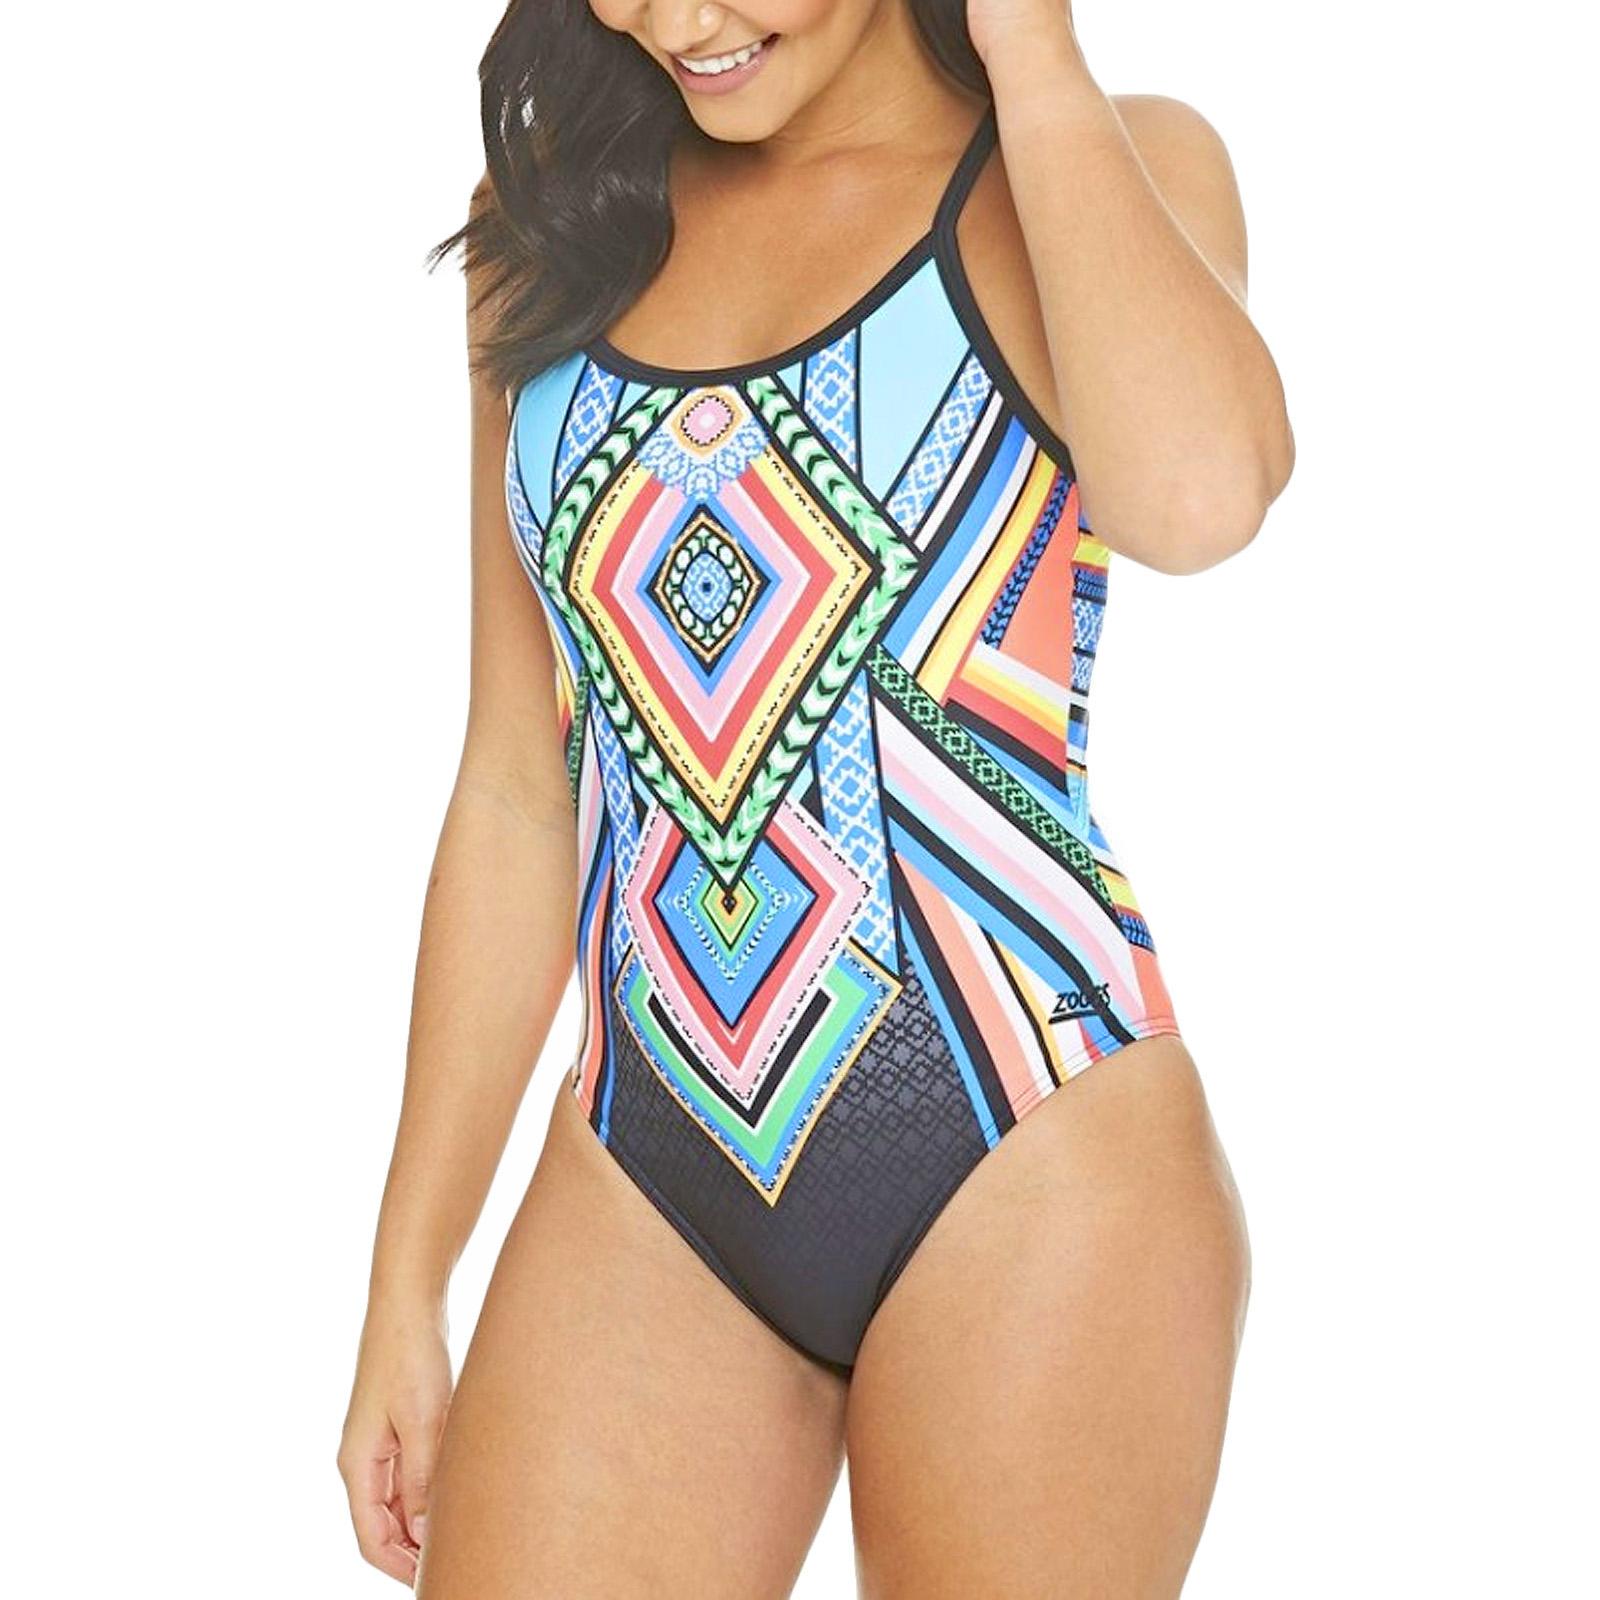 Grey Zoggs Womens Tassles Triback Swimming Pool Swim Summer Swimsuit Costume